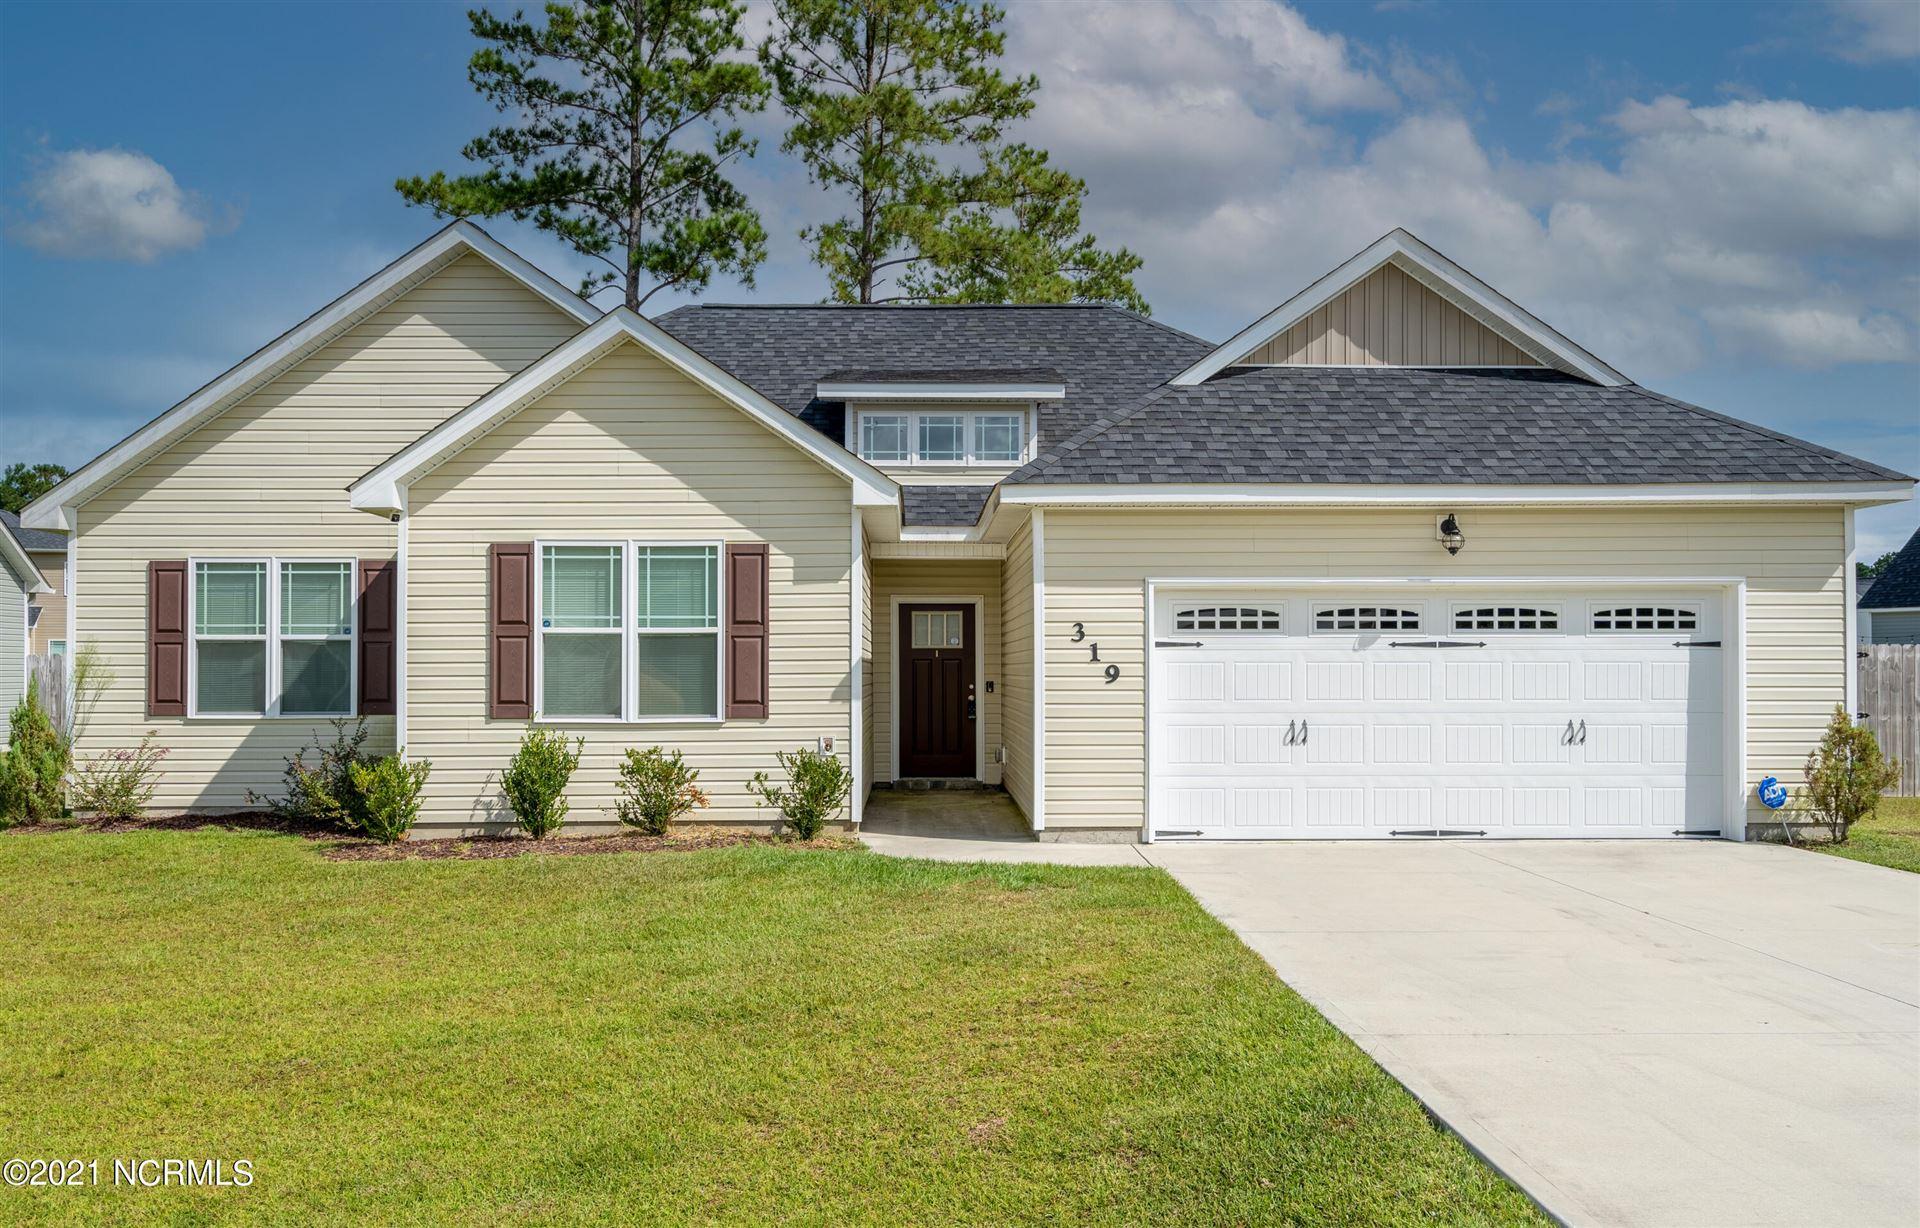 Photo of 319 Adobe Lane, Jacksonville, NC 28546 (MLS # 100291267)